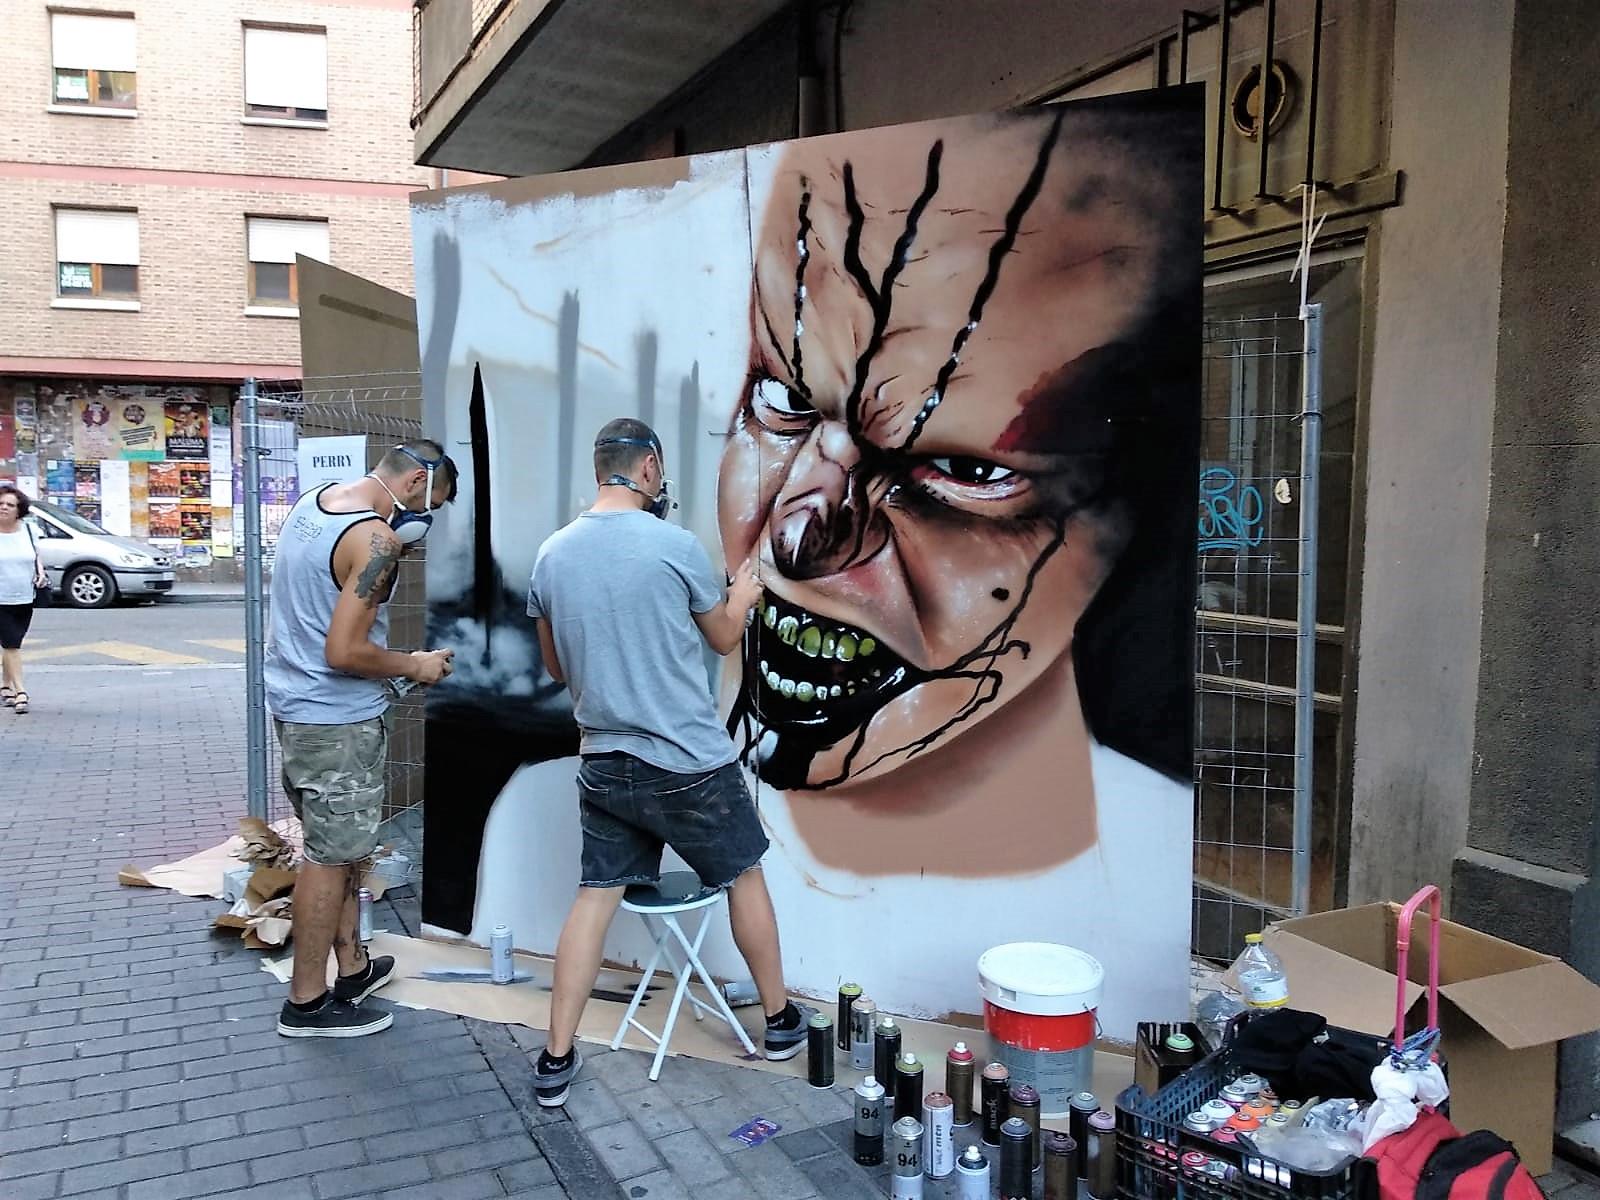 dani perry san antolin infame fiestas palencia arte urbano mural